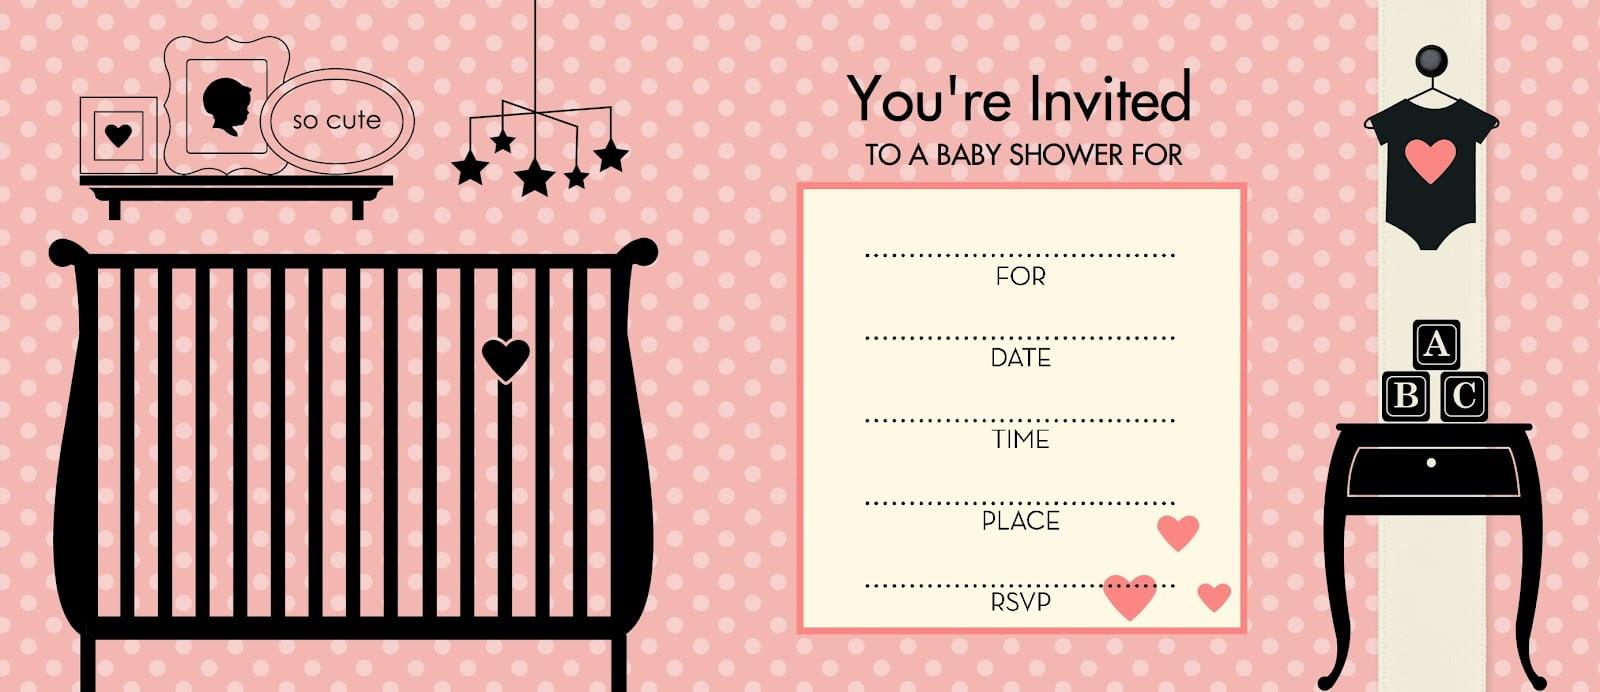 Make Baby Shower Invitations Online Free